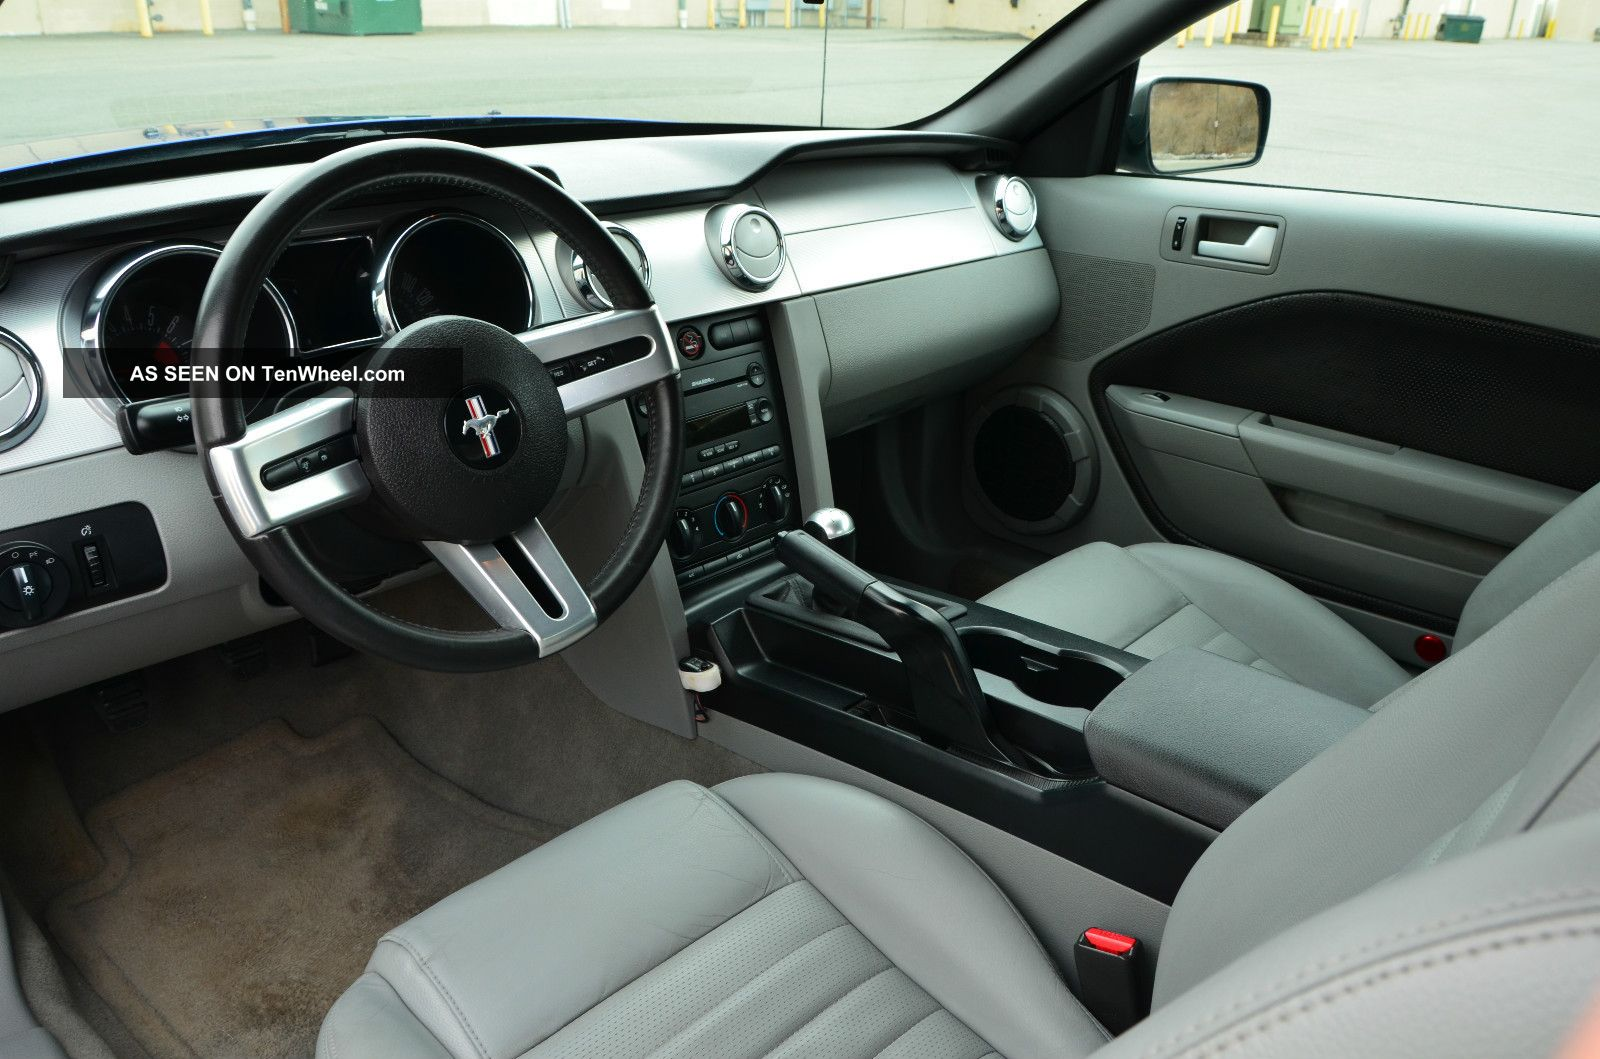 2005 Mustang Gt Convertible